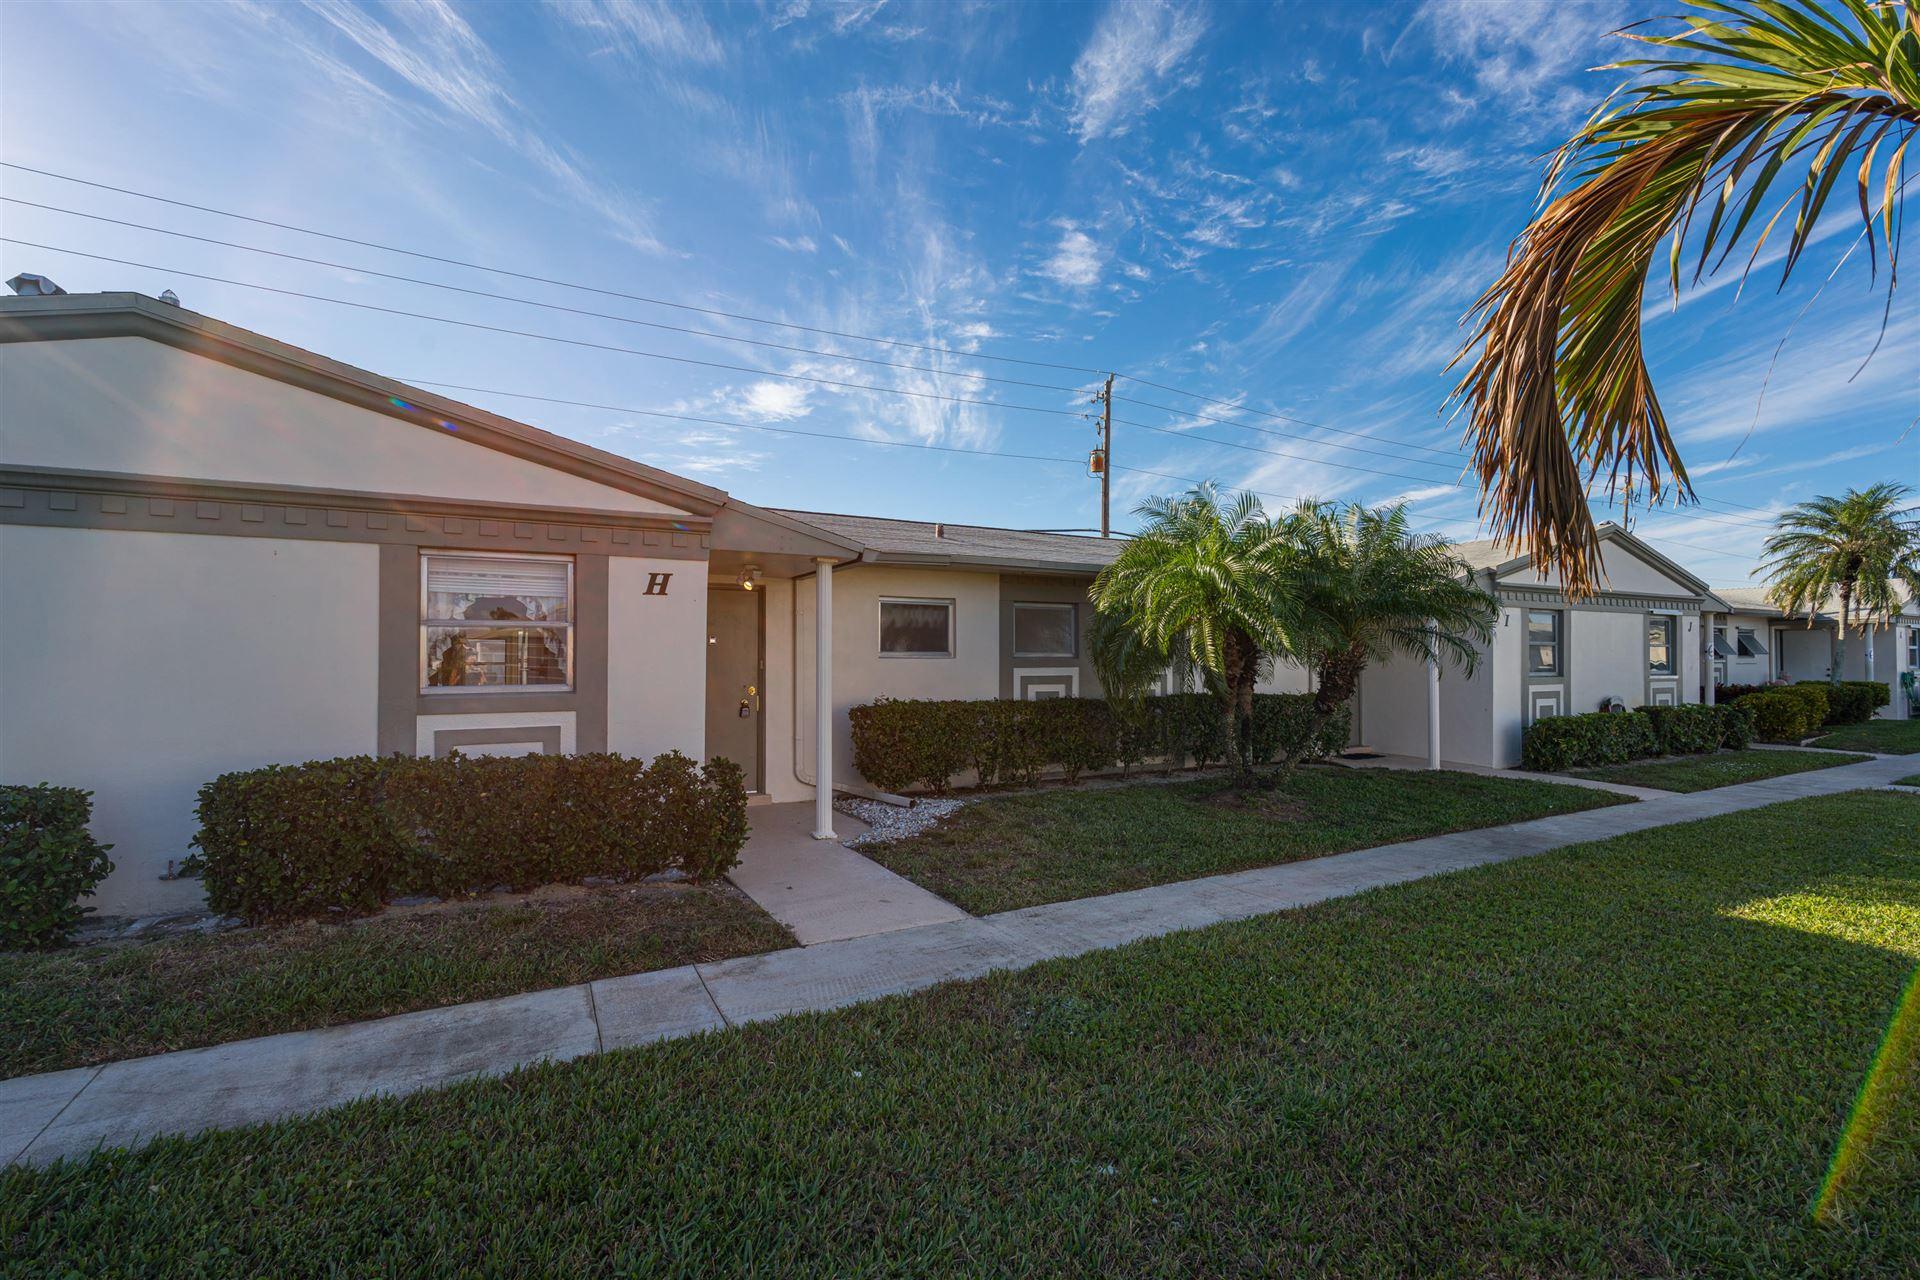 2823 Crosley Drive #H, West Palm Beach, FL 33415 - MLS#: RX-10691563